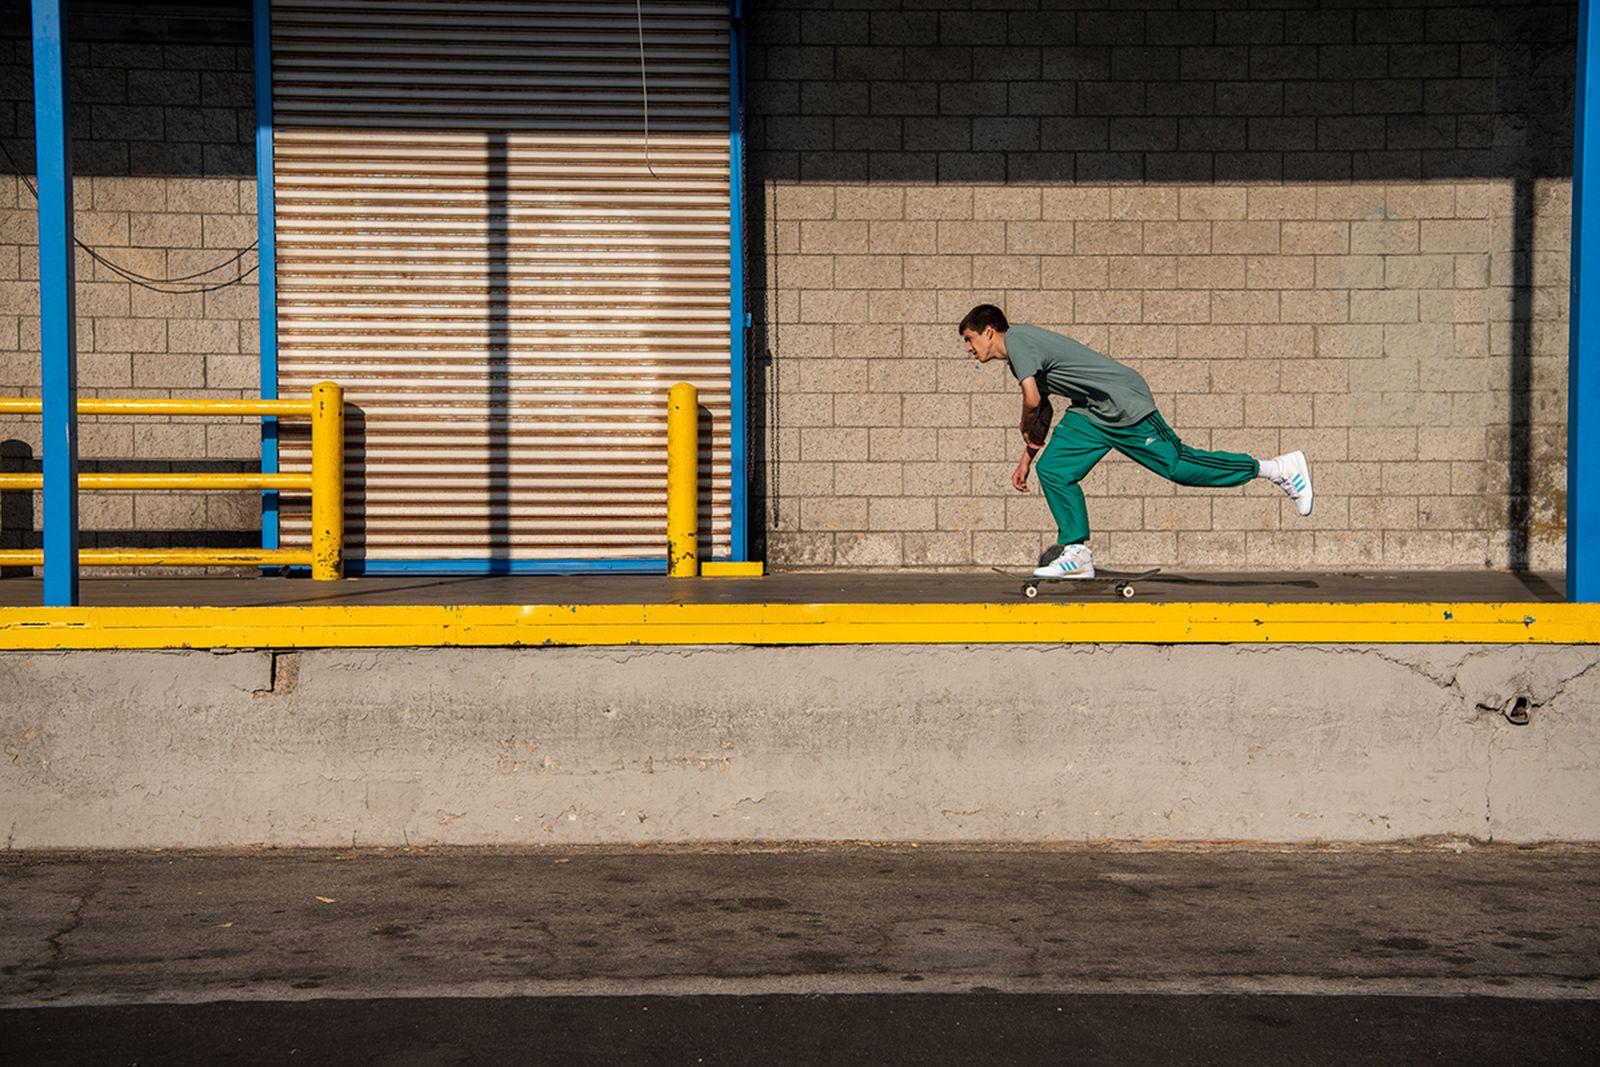 adidas-skateboarding-forum-84-adv-diego-najera-release-date-price-004